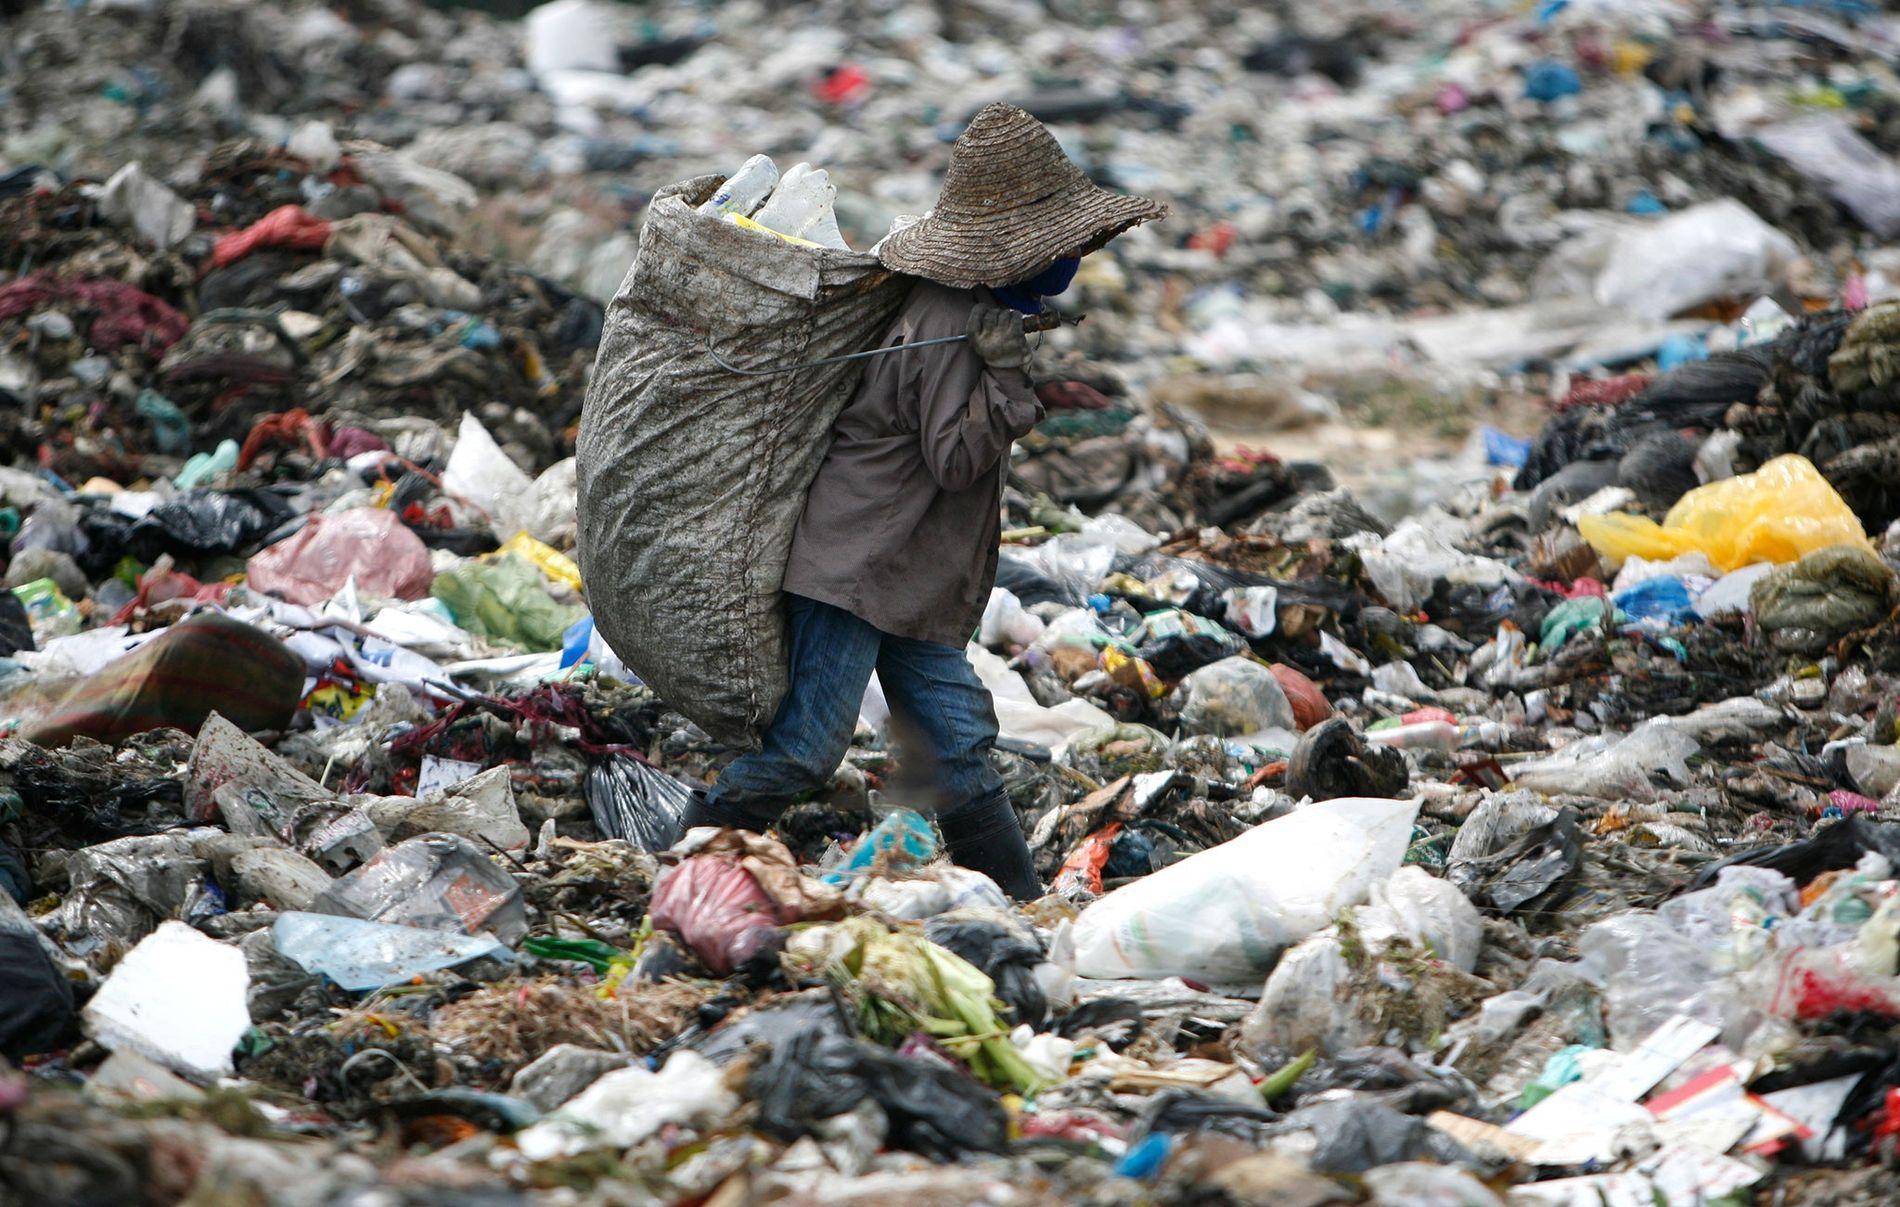 Un hombre busca plástico para reciclar en un sitio de basura en Malasia.